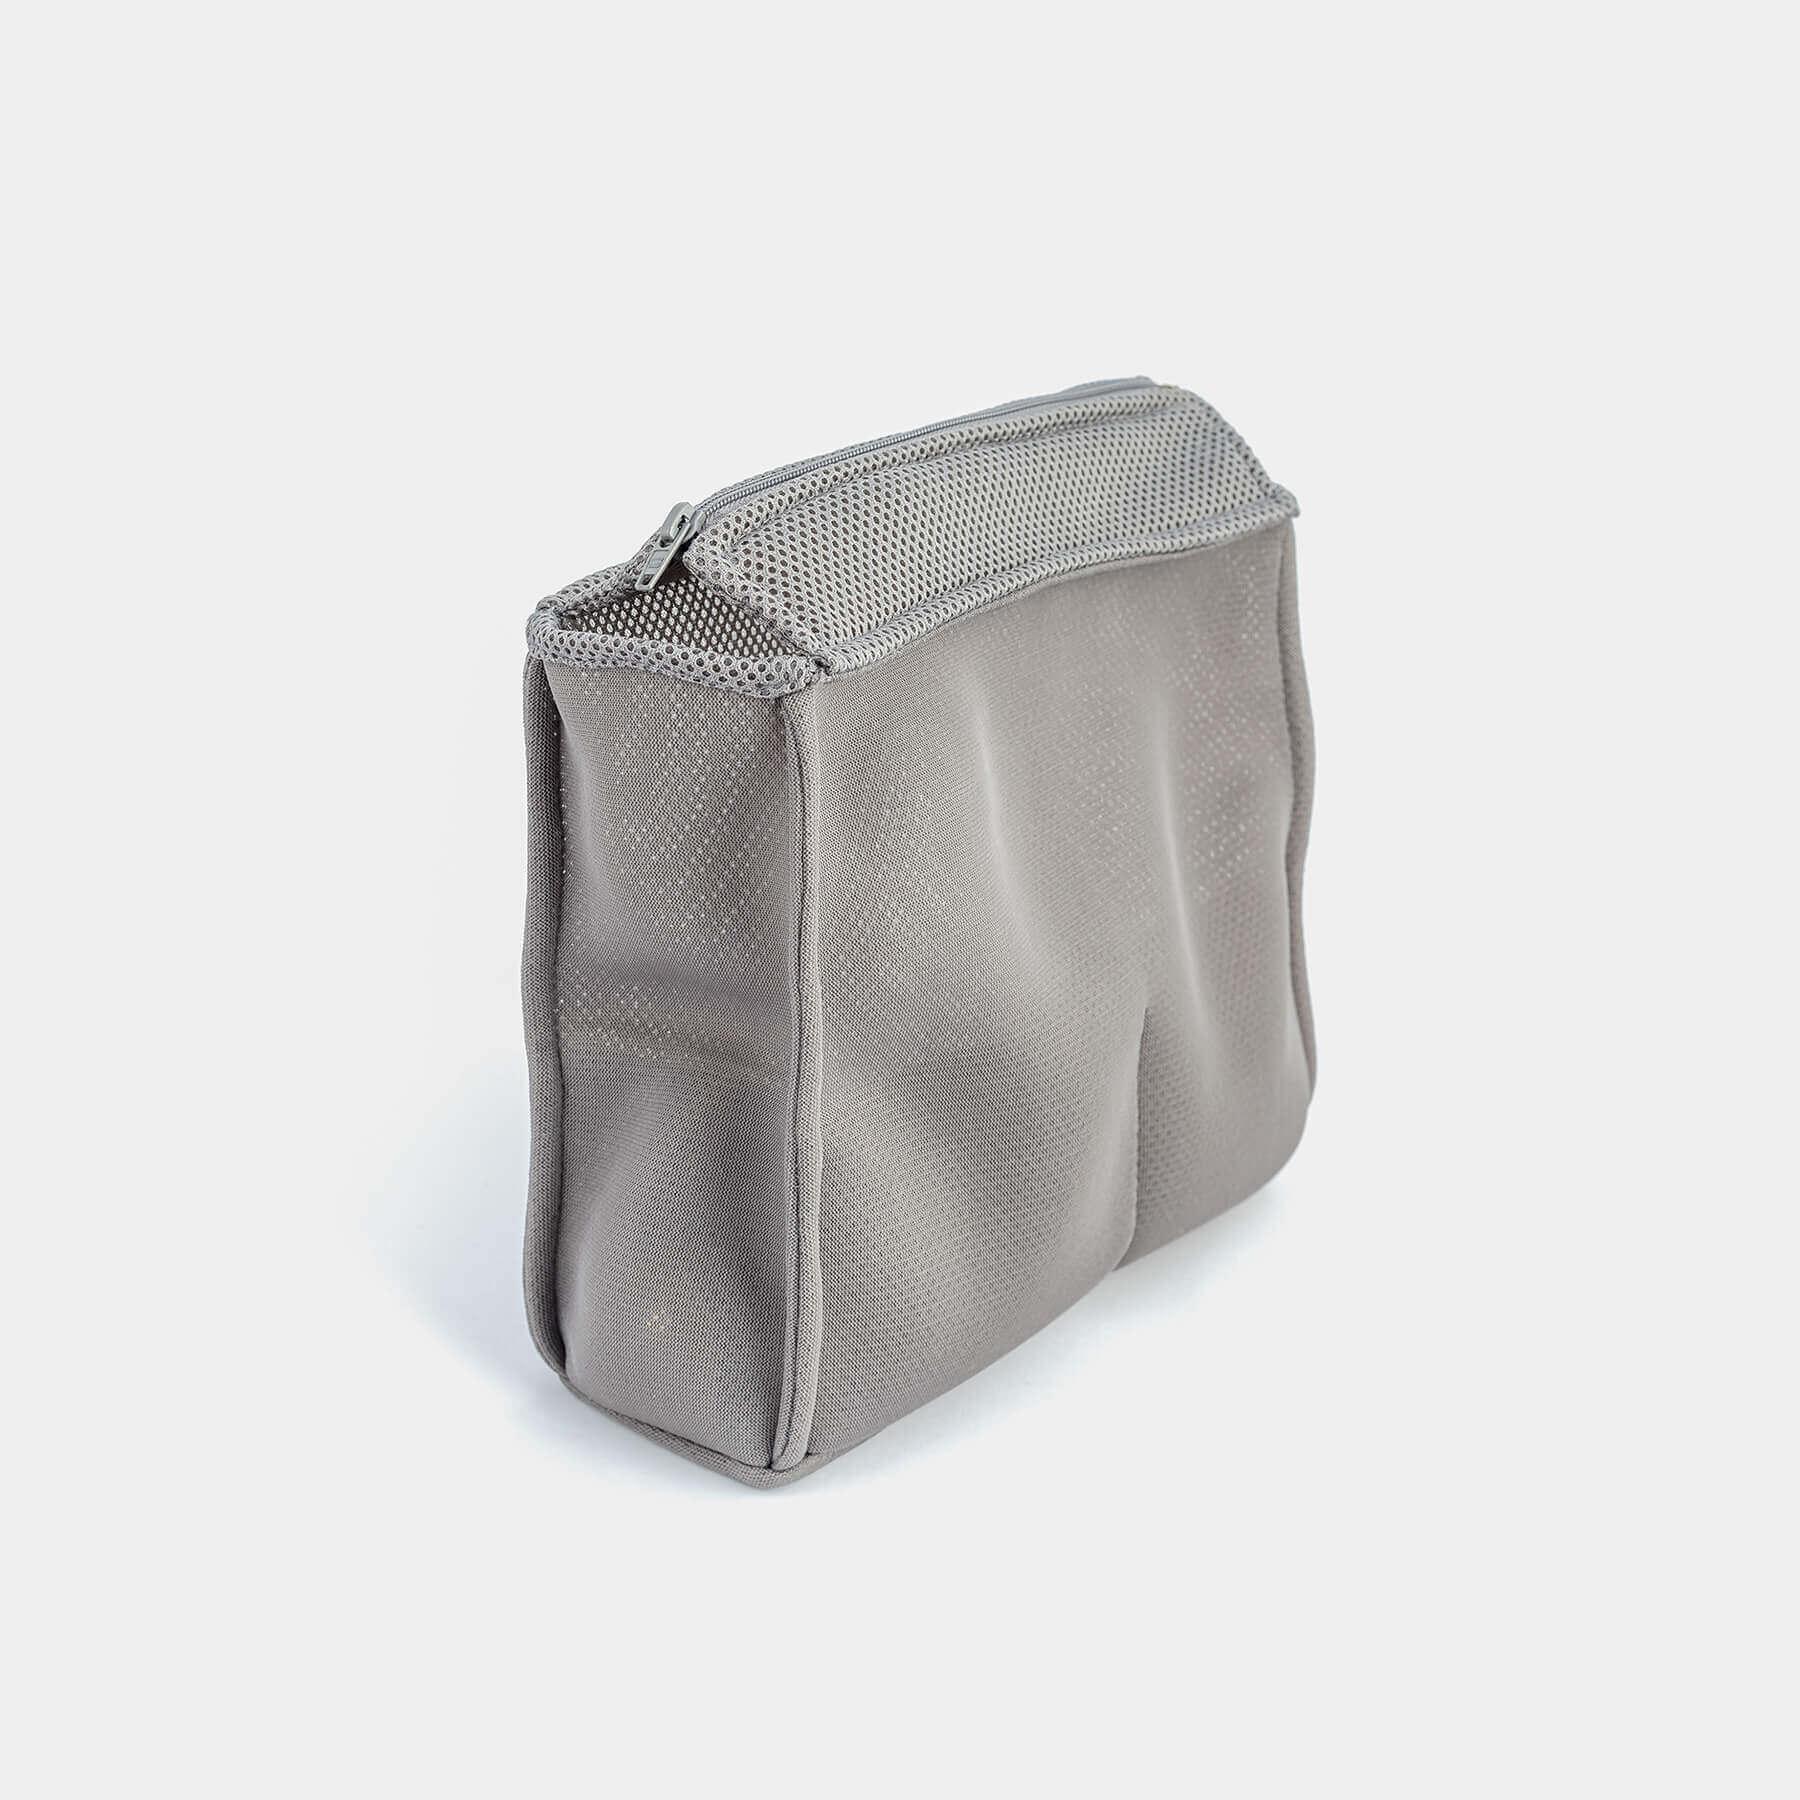 Divisória Interna 'Tess' Grey